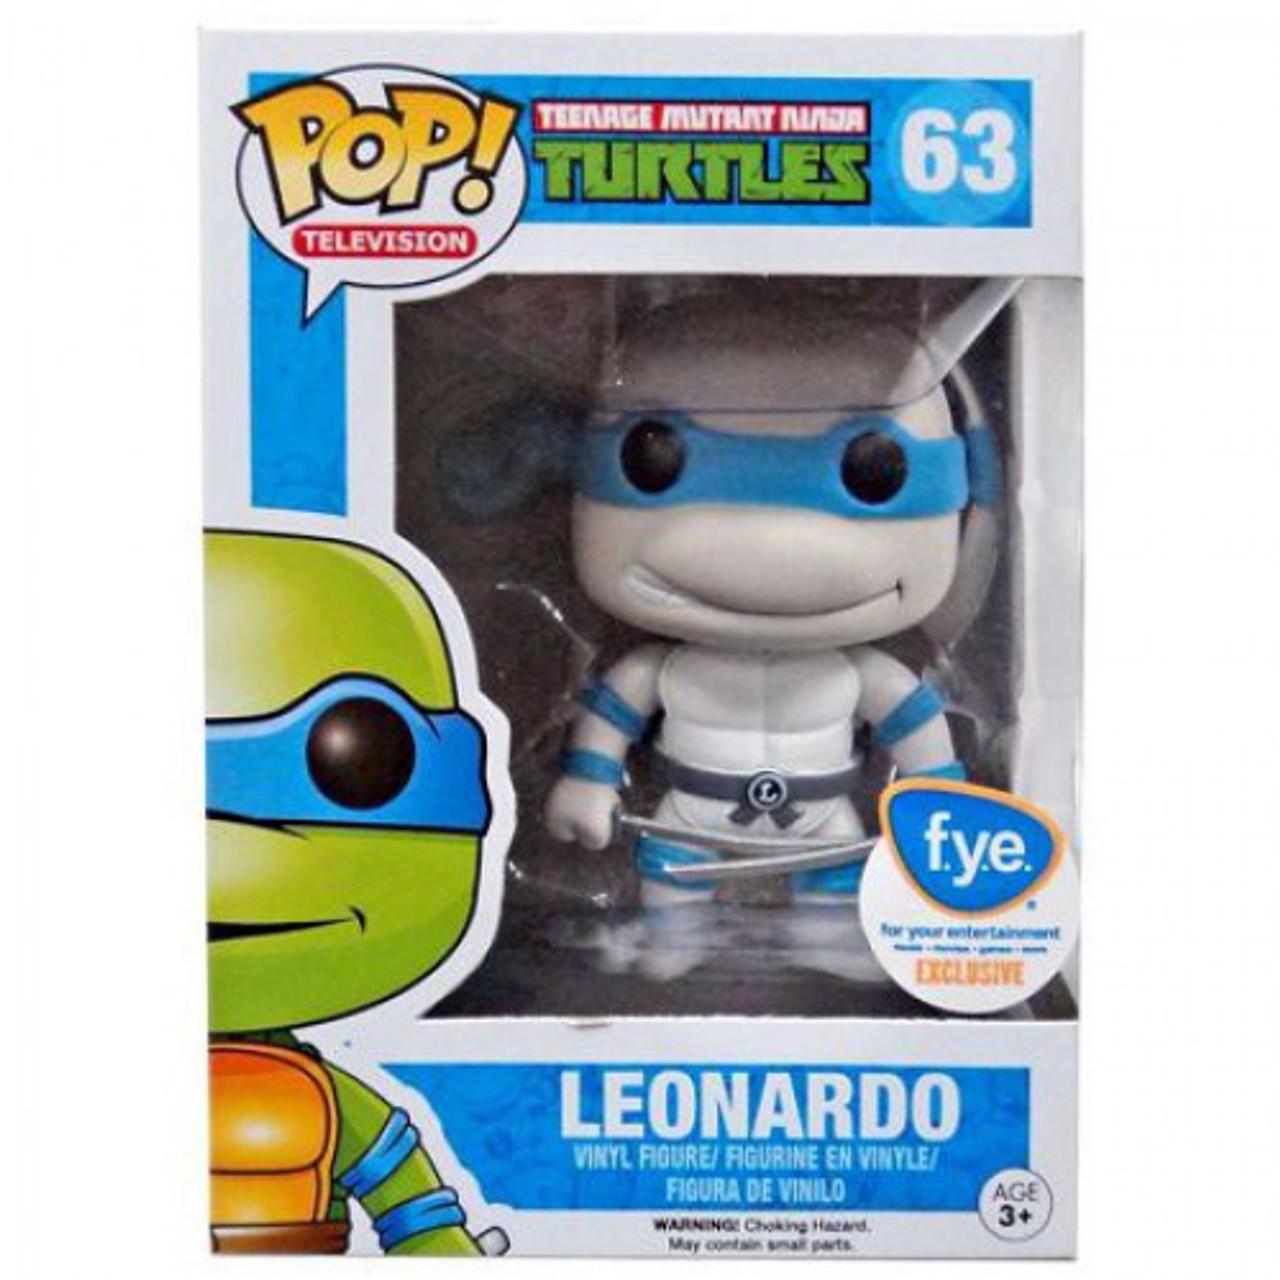 b4fb4c5baa9 Funko Teenage Mutant Ninja Turtles Funko POP TV Leonardo Exclusive Vinyl  Figure 63 Black White - ToyWiz